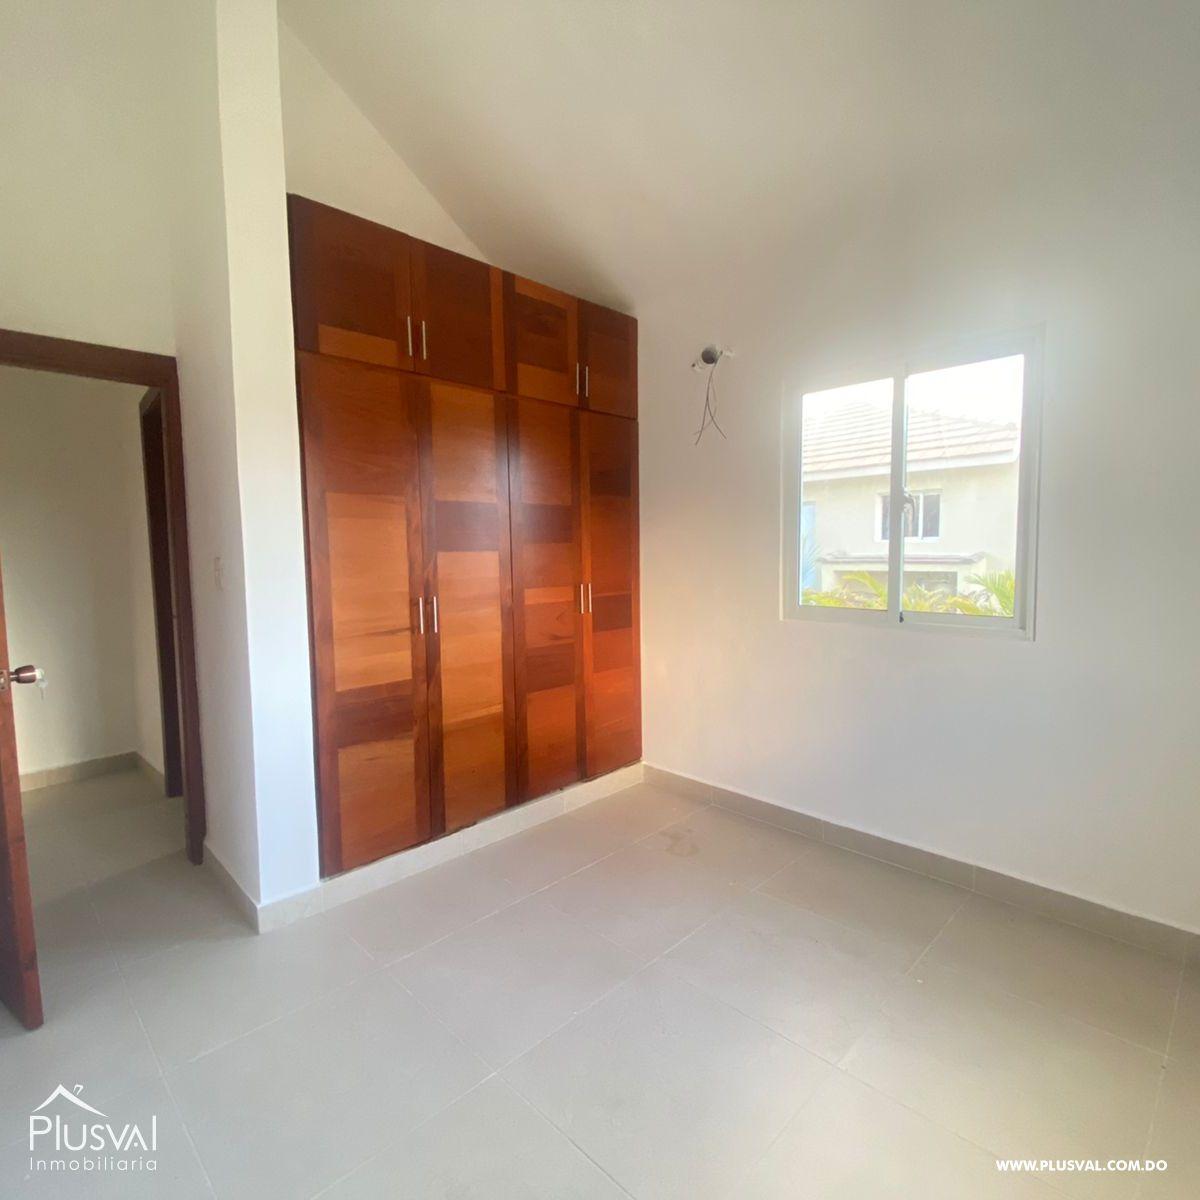 Proyecto exclusivo de casas con piscina en Punta Cana 174083